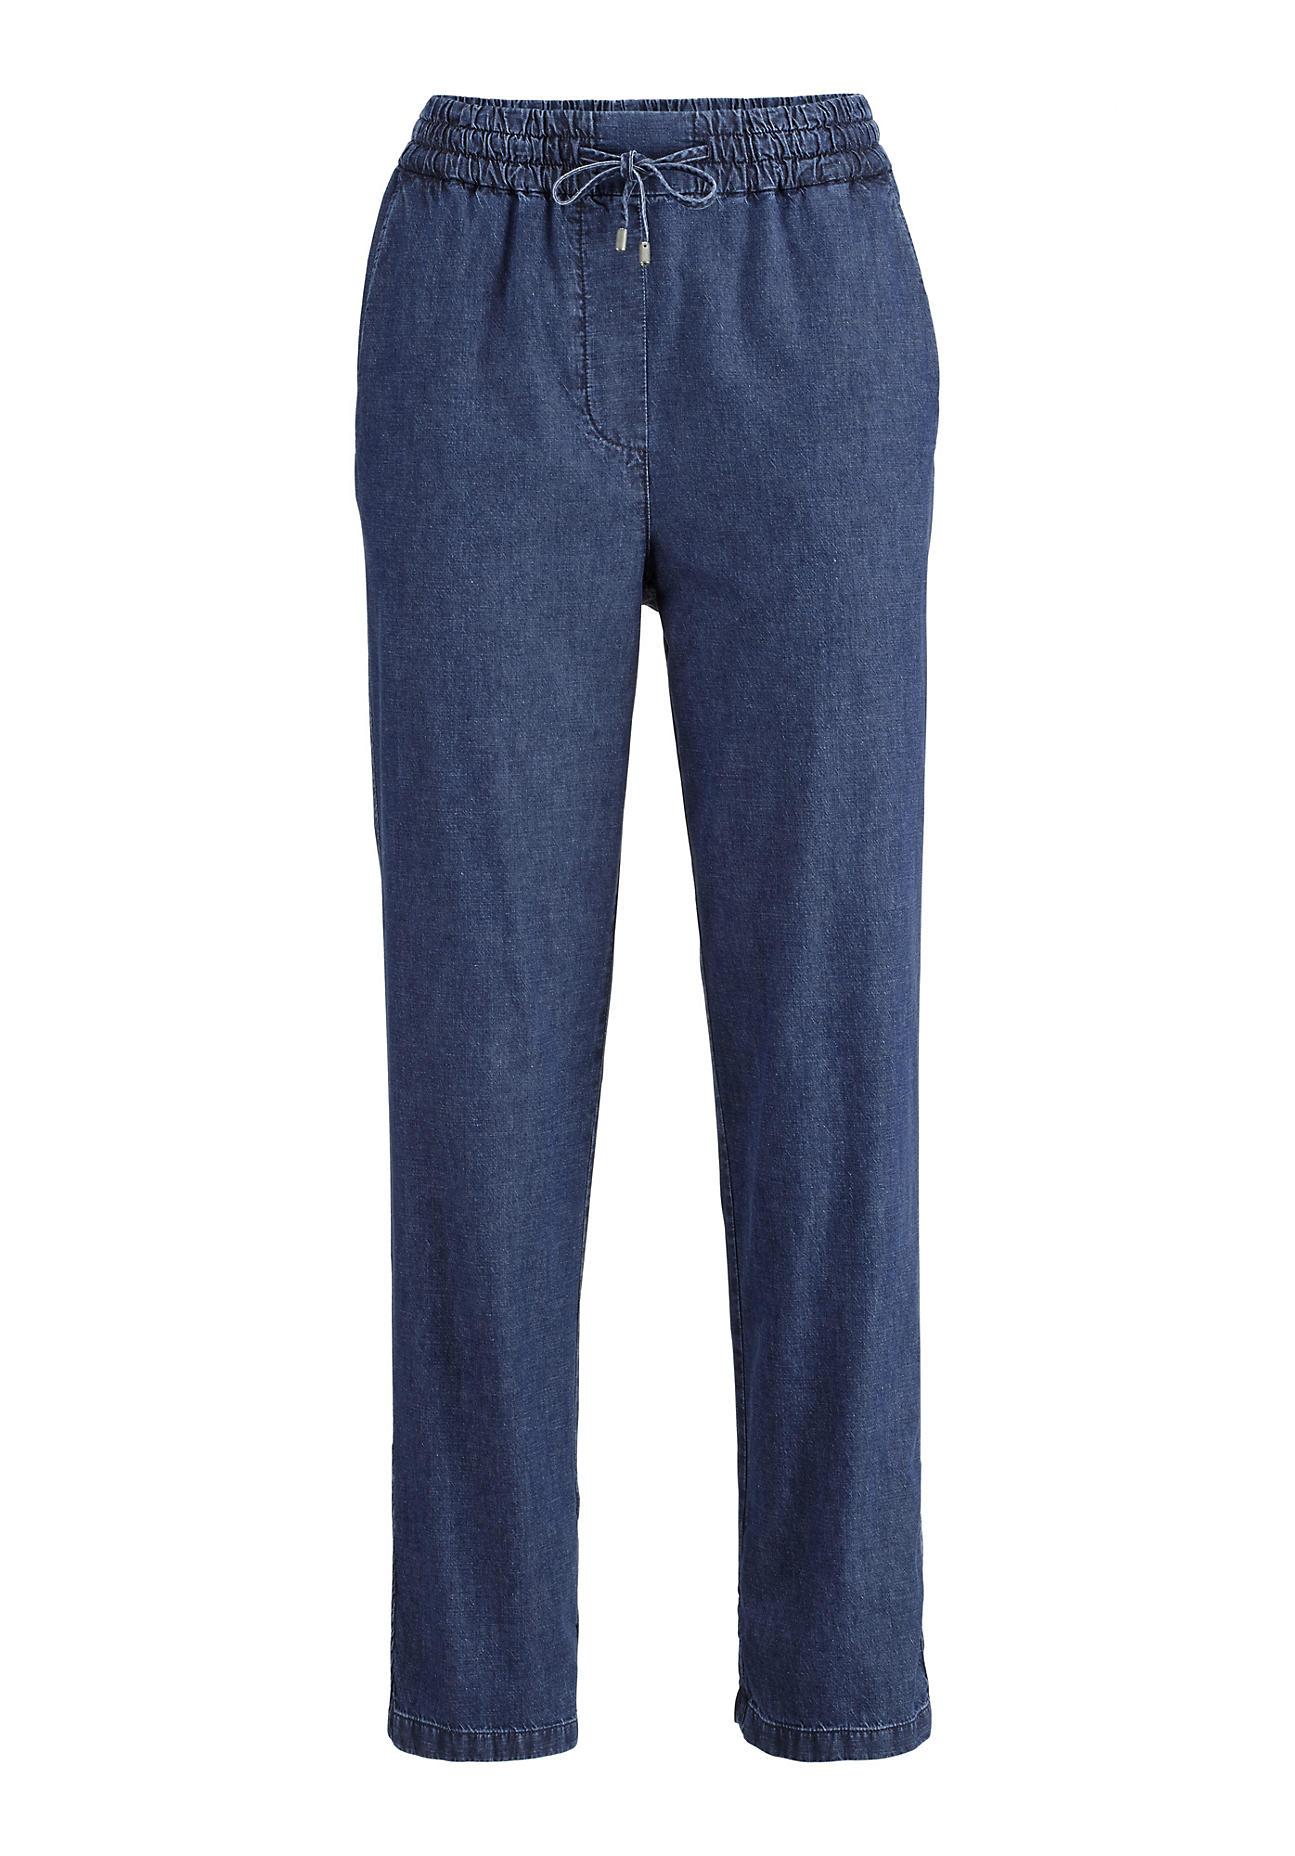 Hosen - hessnatur Damen Jeans Joggpant aus Bio Baumwolle mit Leinen – blau –  - Onlineshop Hessnatur